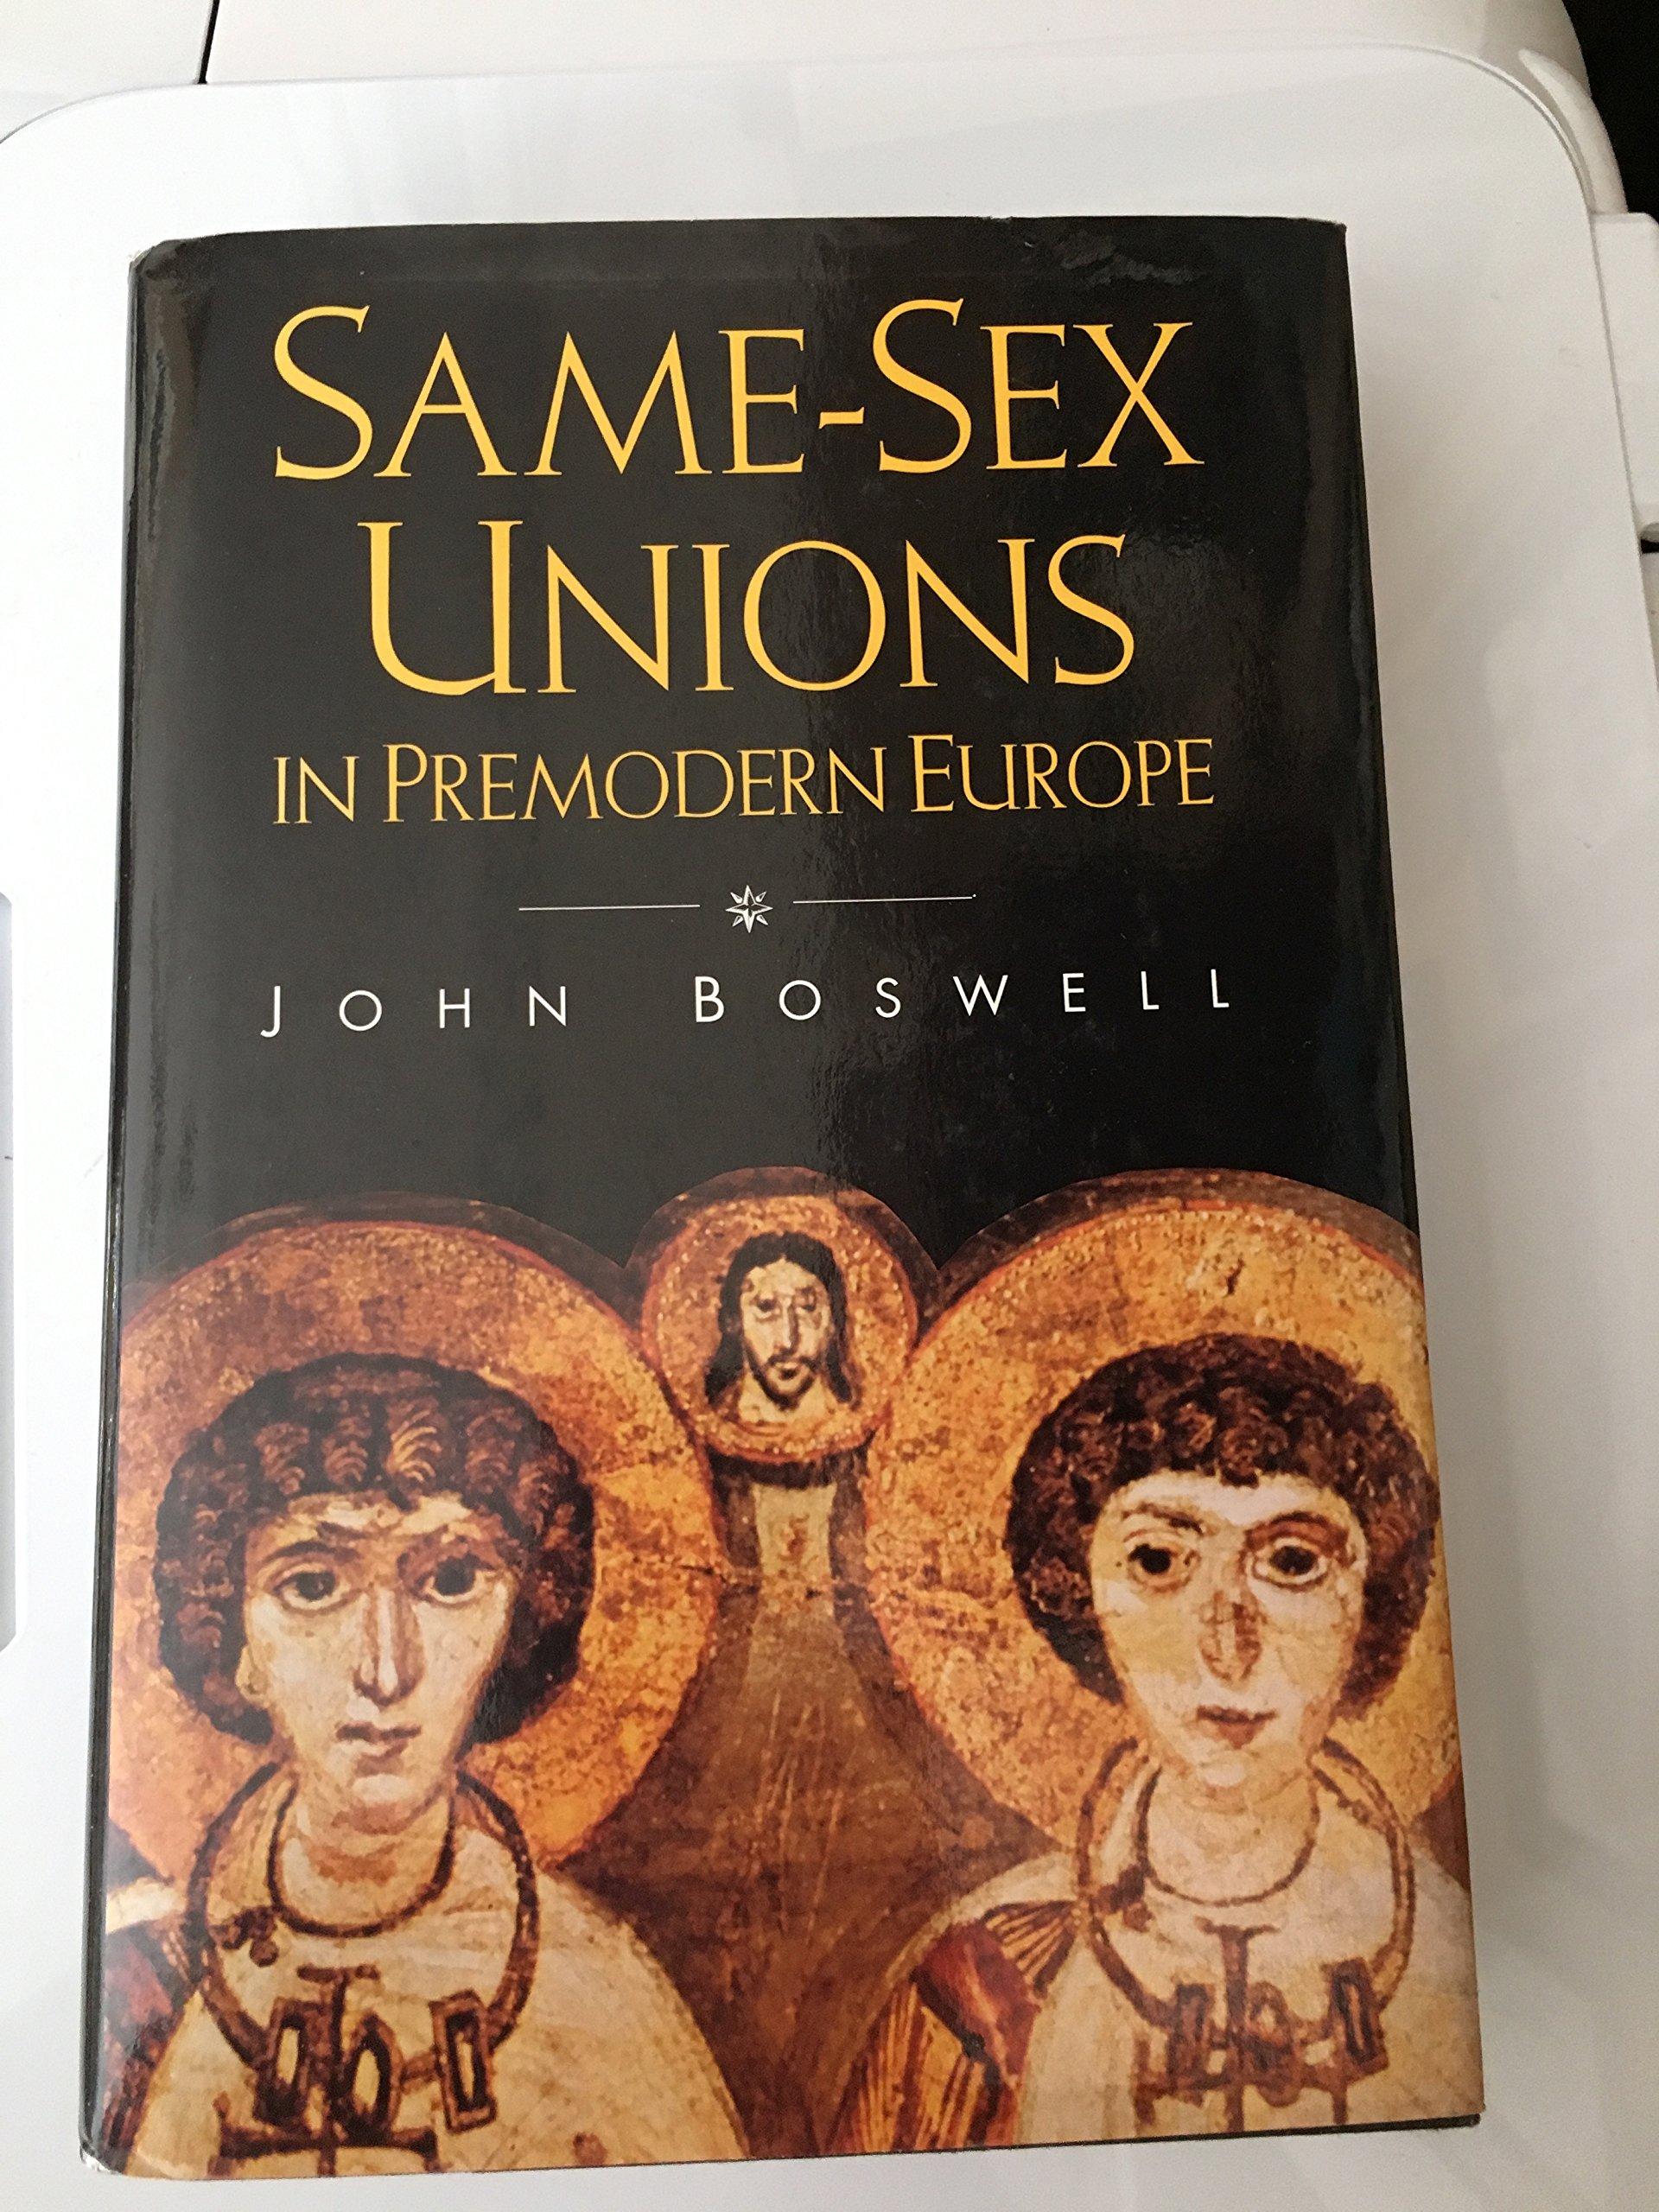 Samesex Unions In Premodern Europe